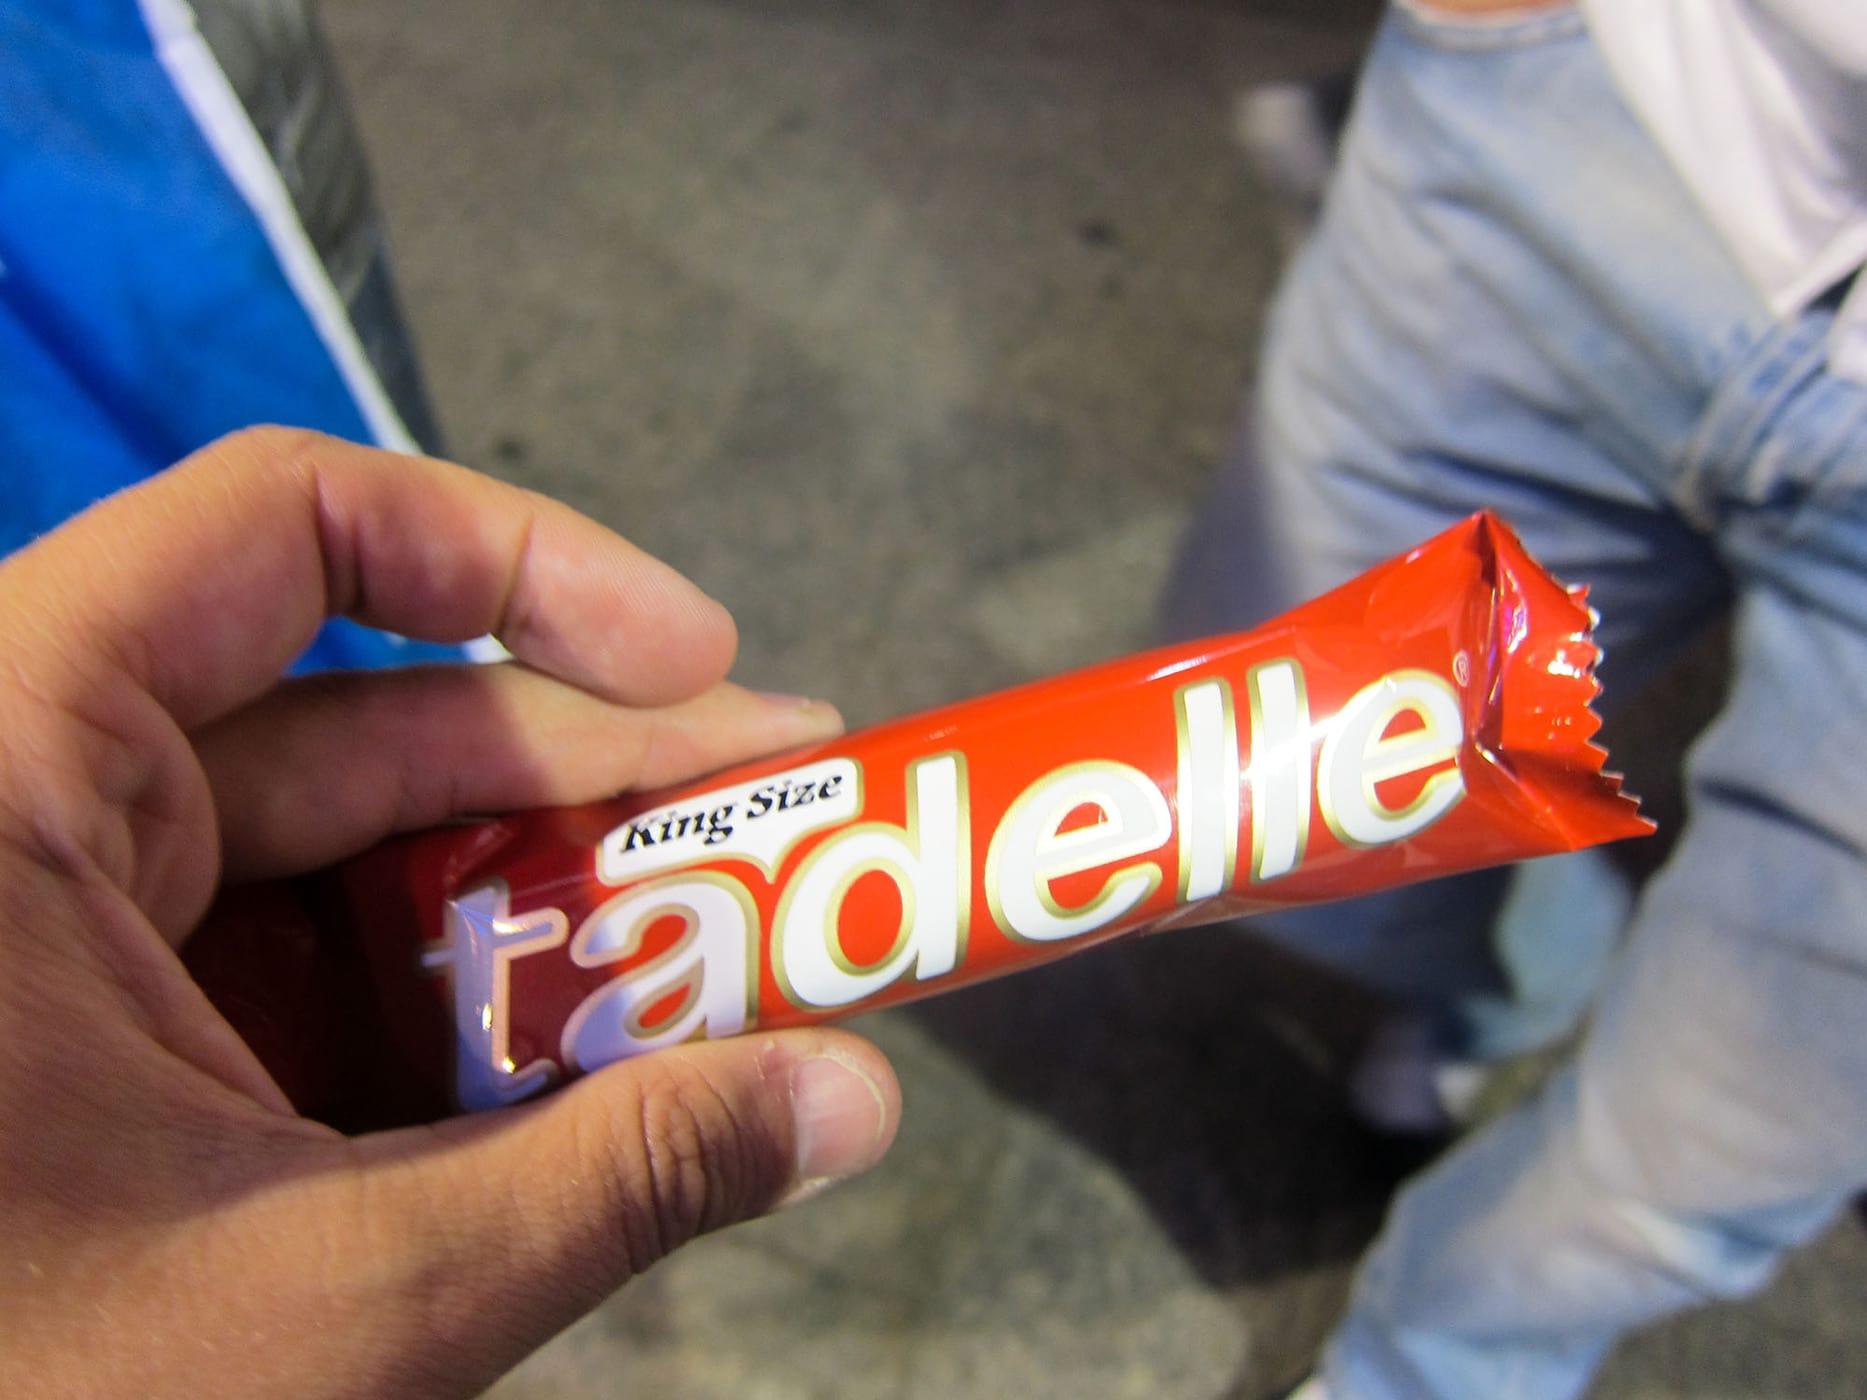 Tadelle candy bar in Istanbul, Turkey